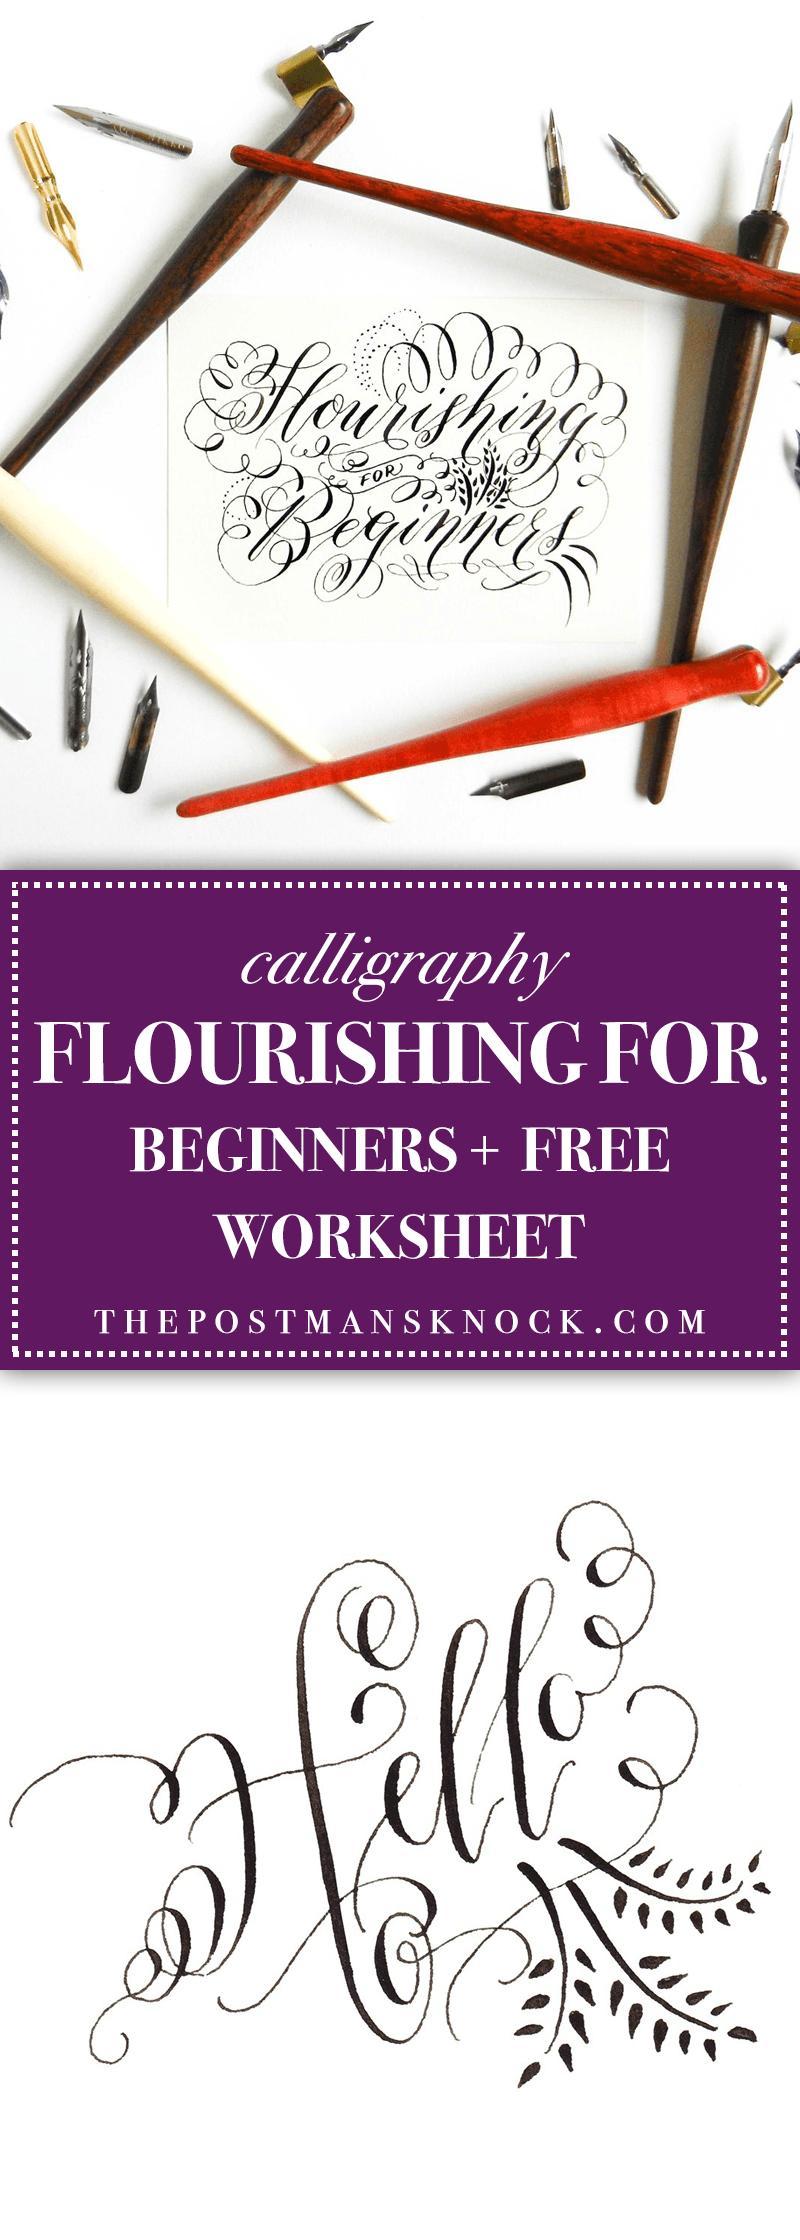 Calligraphy Flourishing for Beginners + Free Worksheet   Kalligraphie